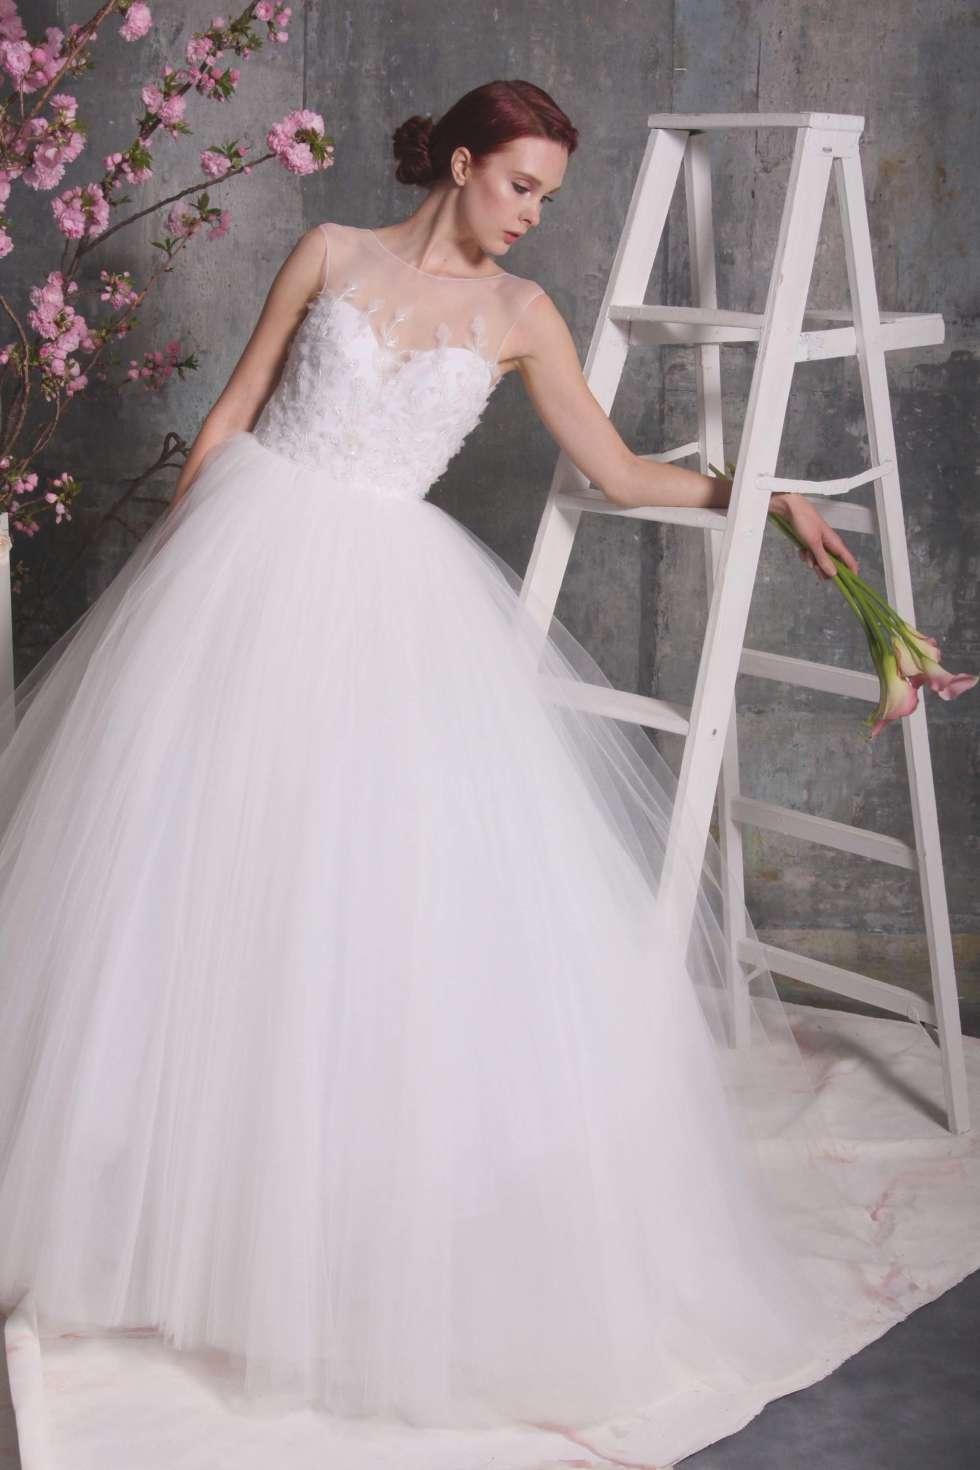 Christian Siriano Wedding Dresses 2 Popular Christian Siriano wedding dress